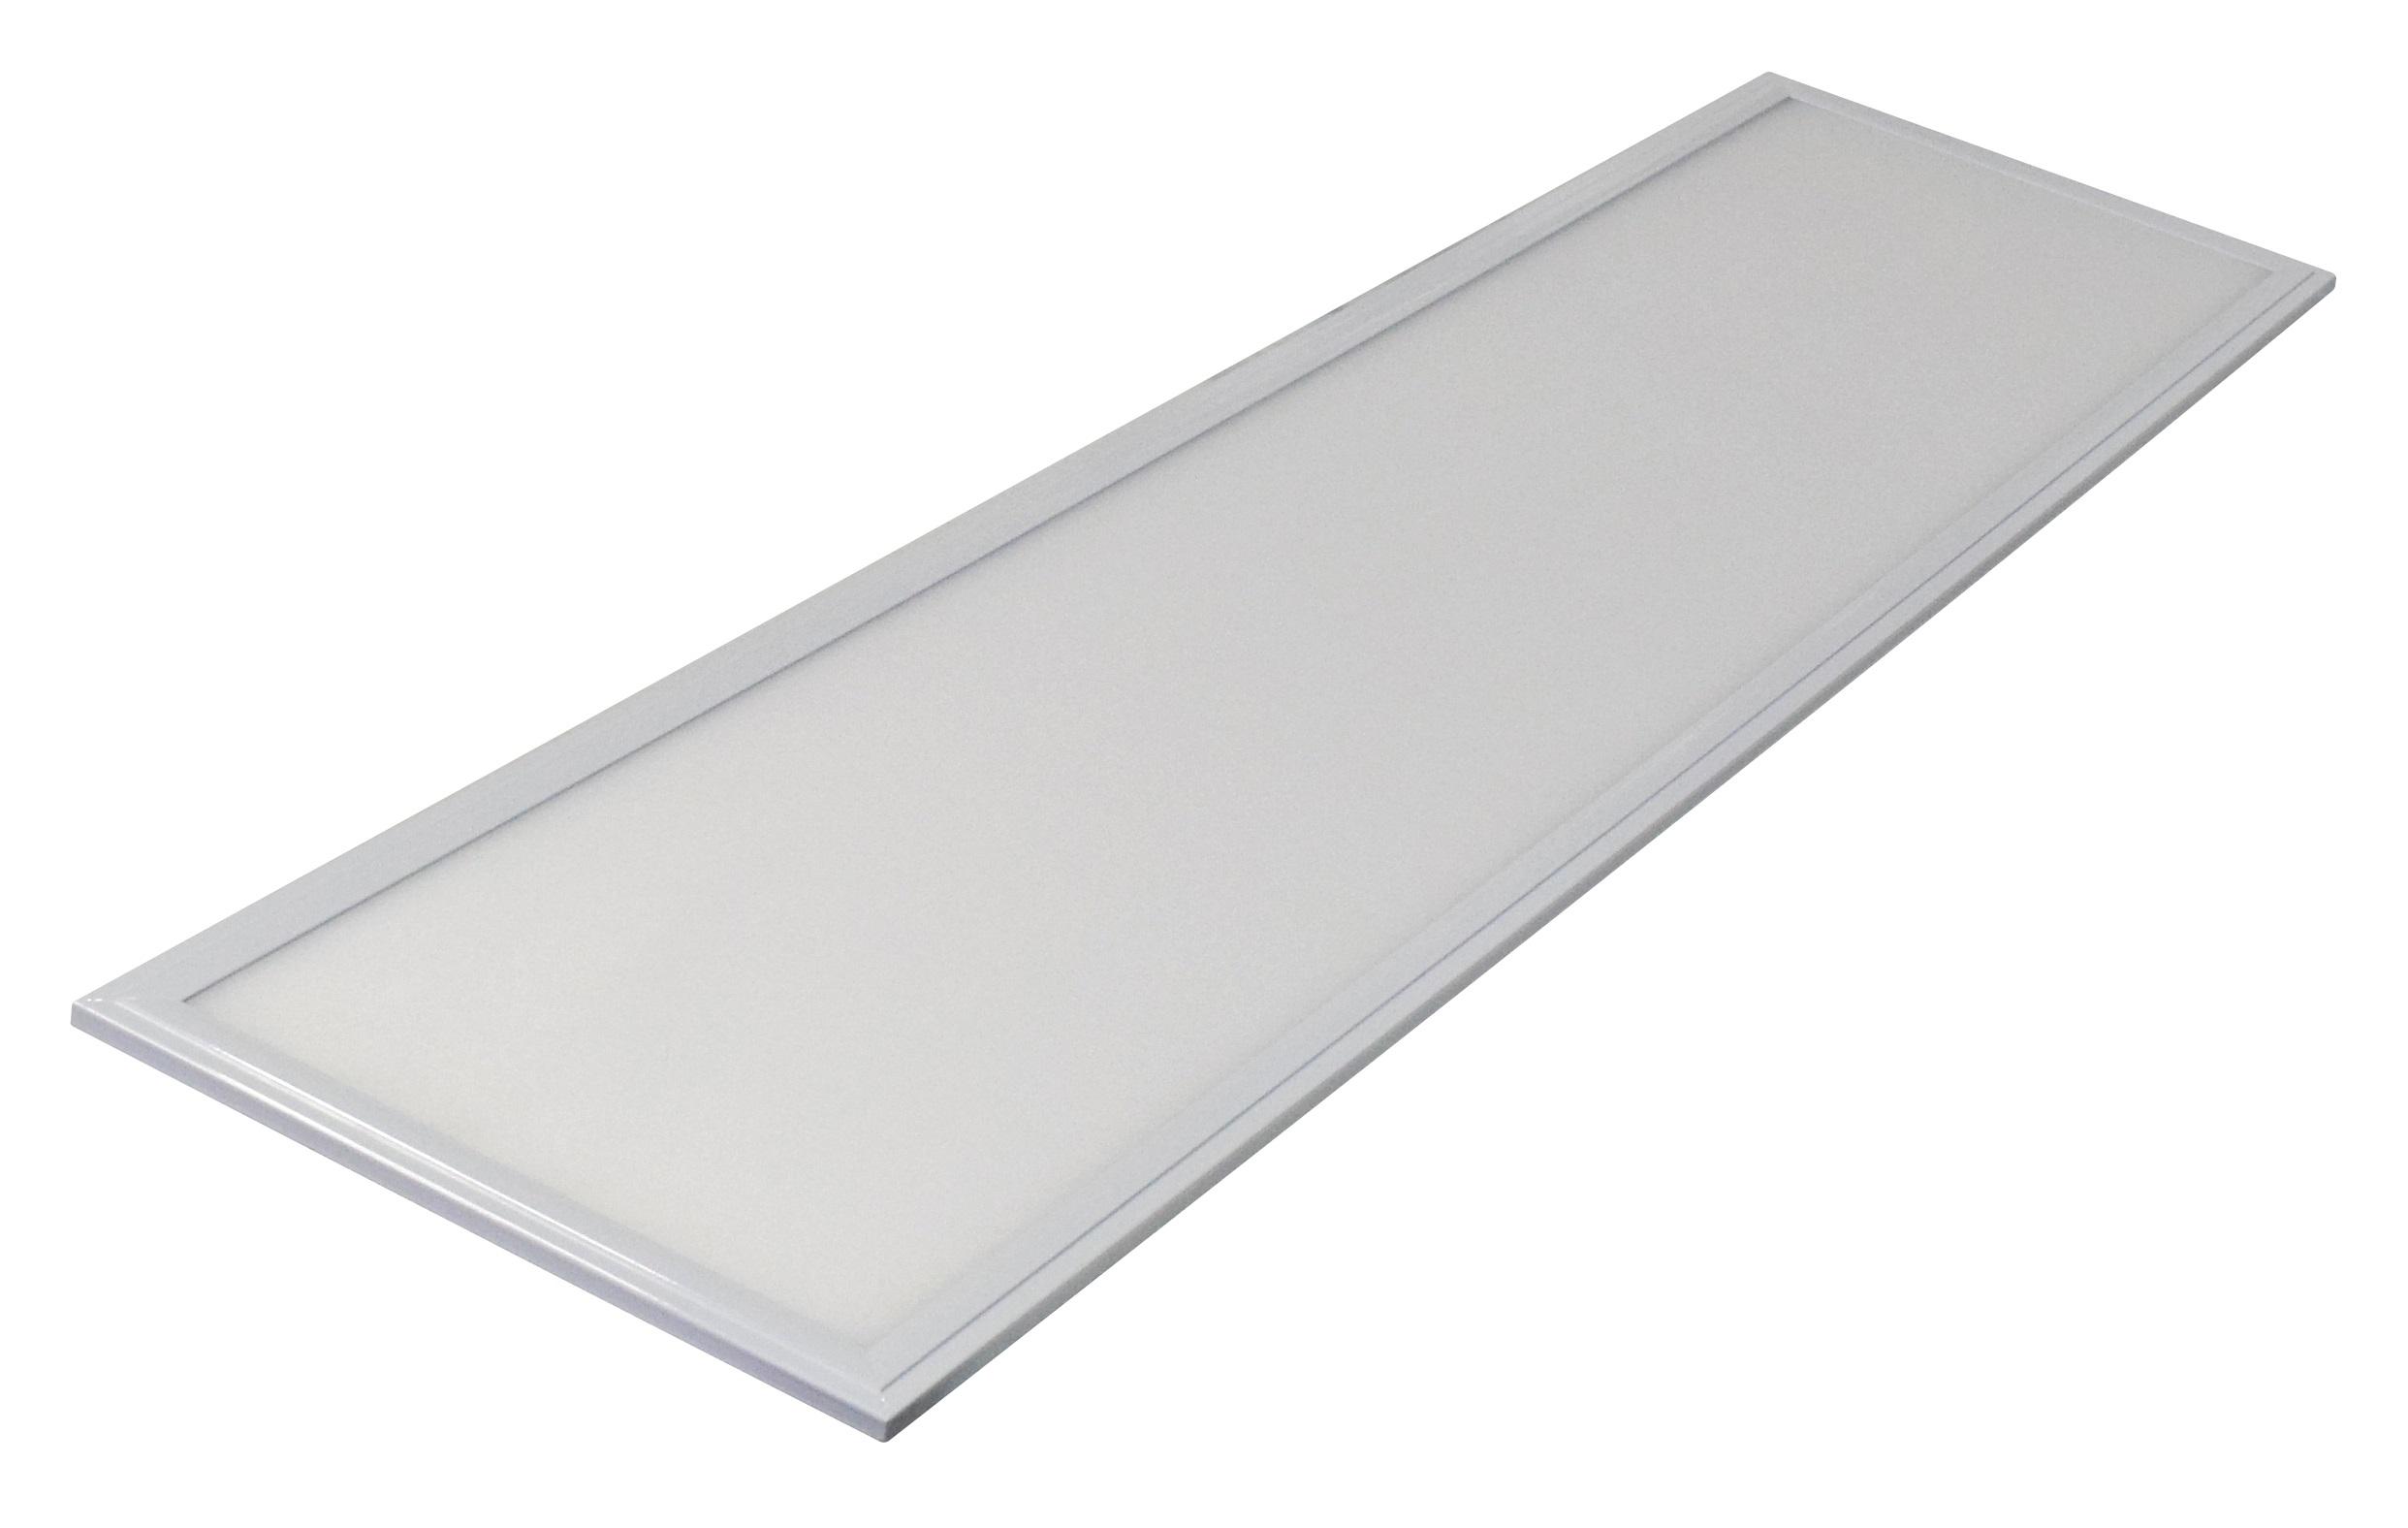 STRATALUX14 LED Flat Panel